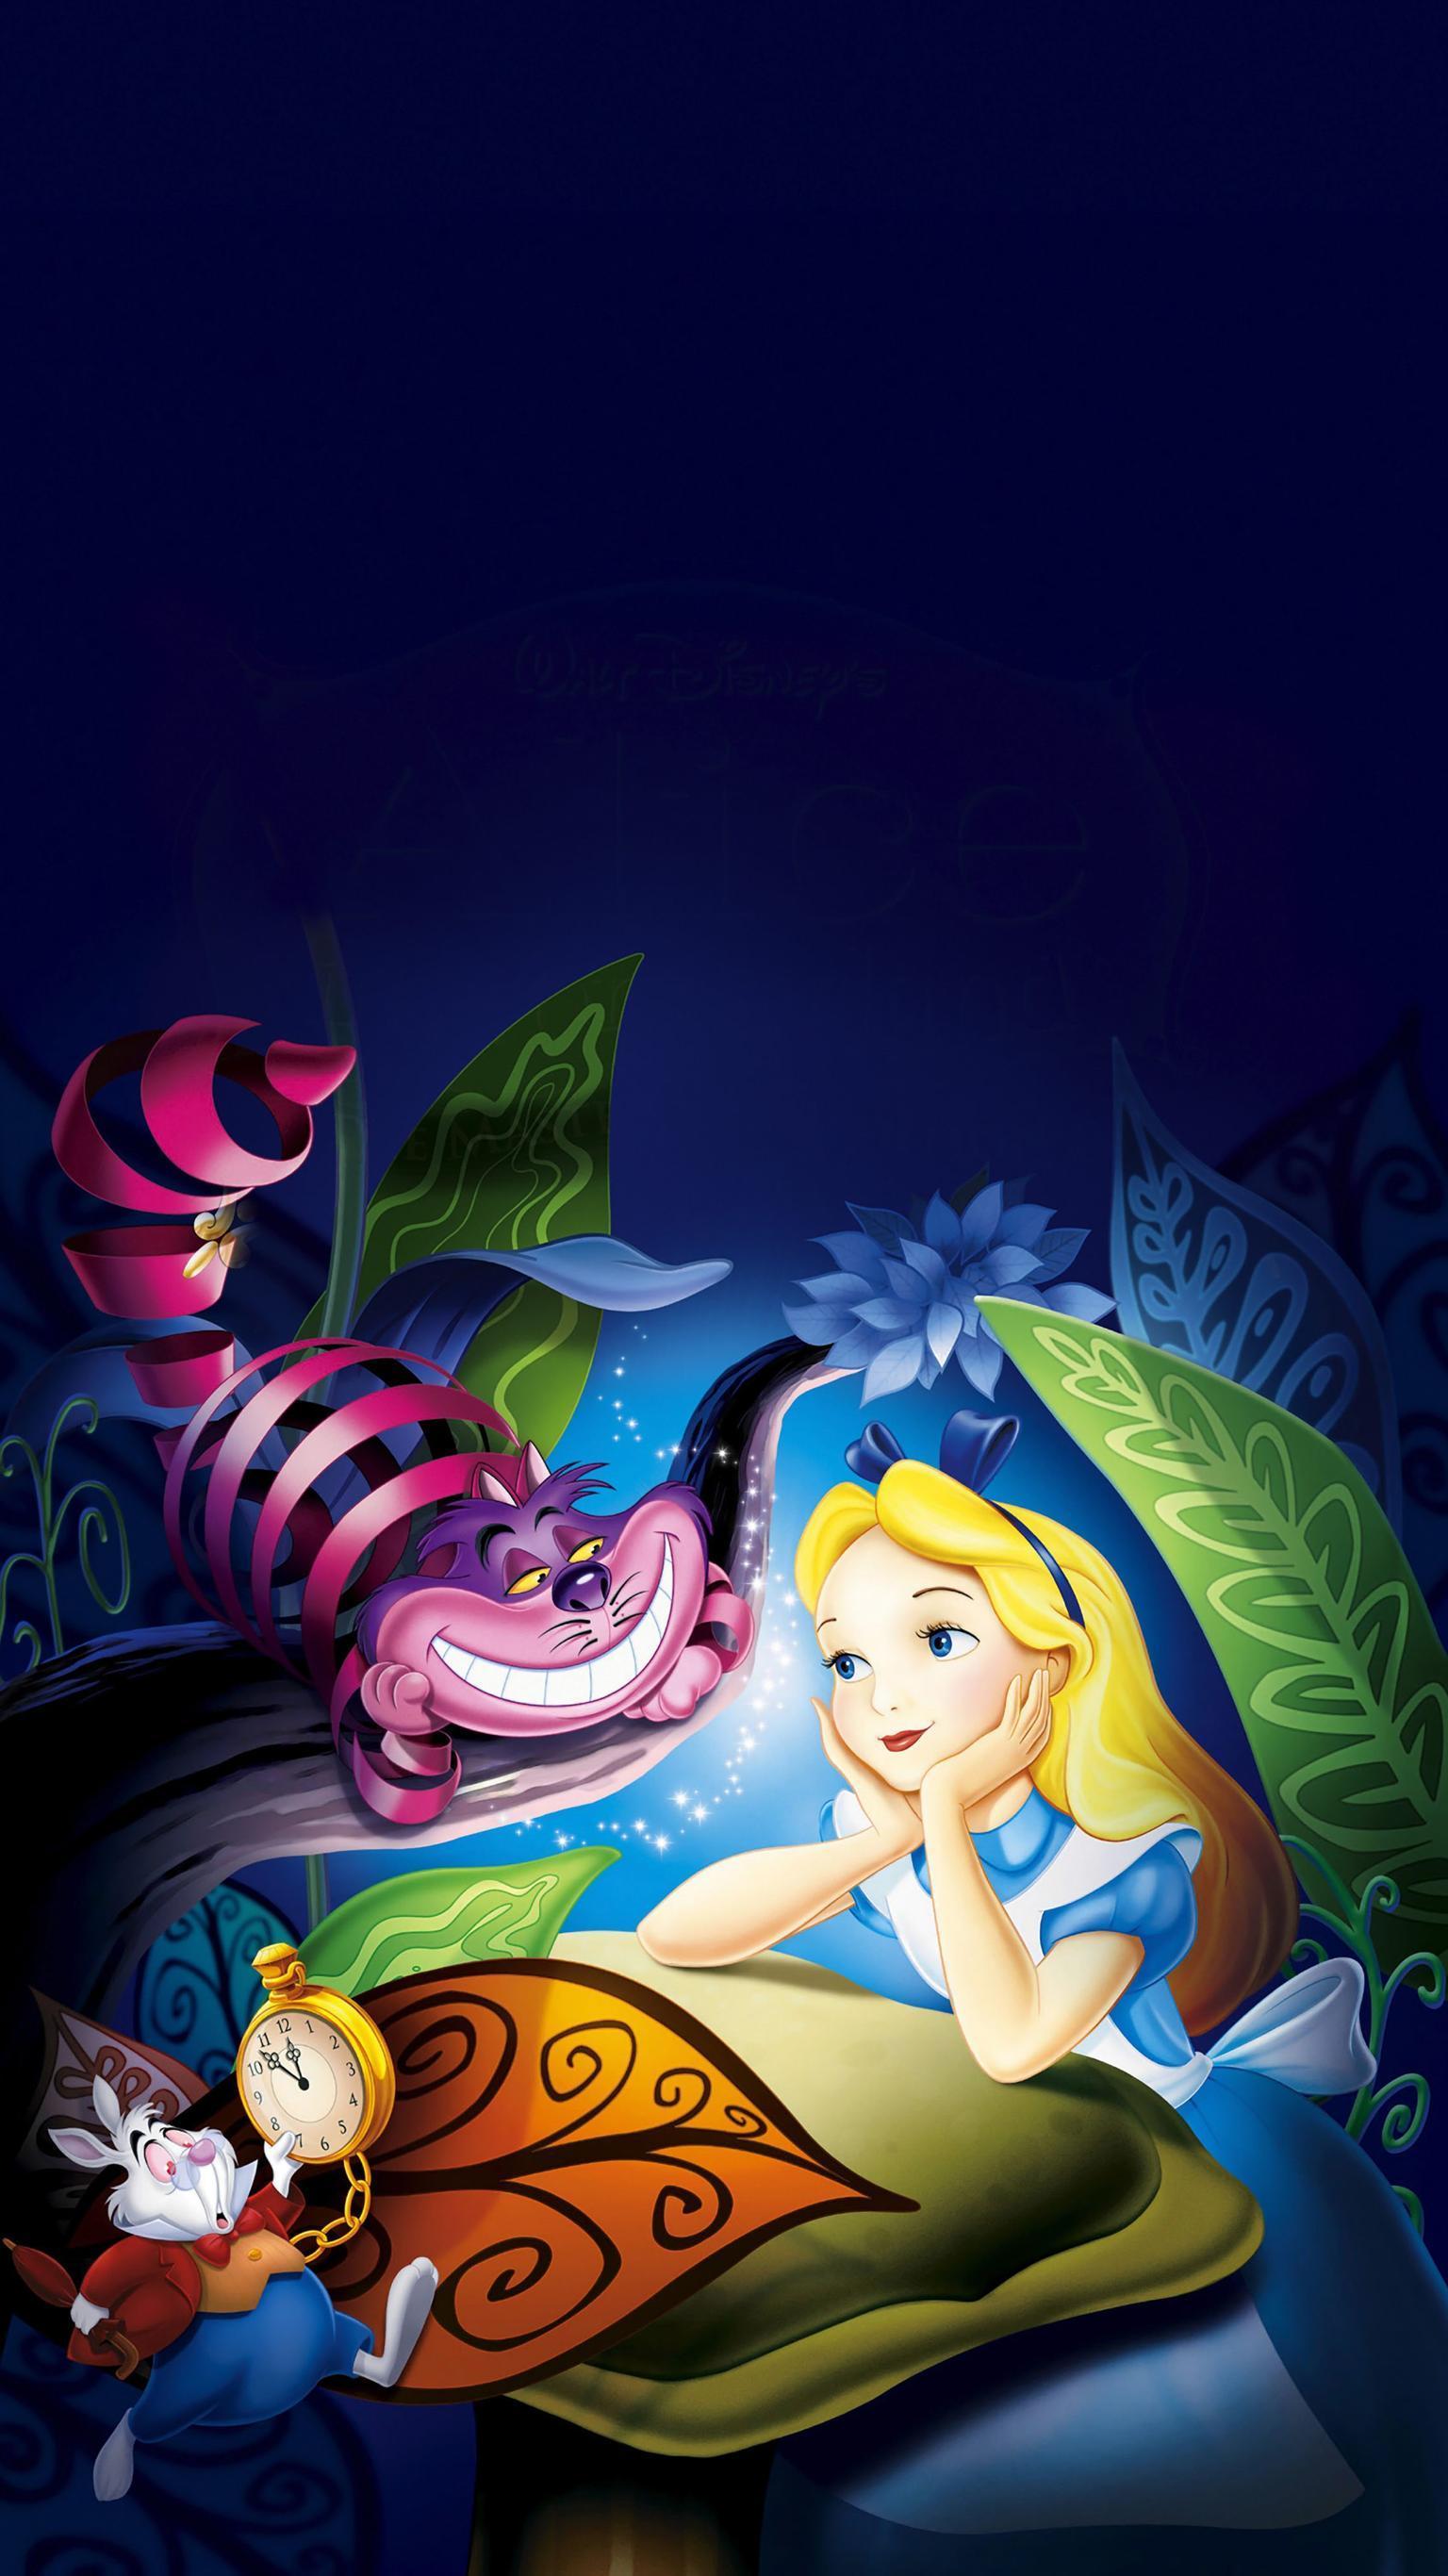 Alice in Wonderland Cartoon Wallpapers - Top Free Alice in ...